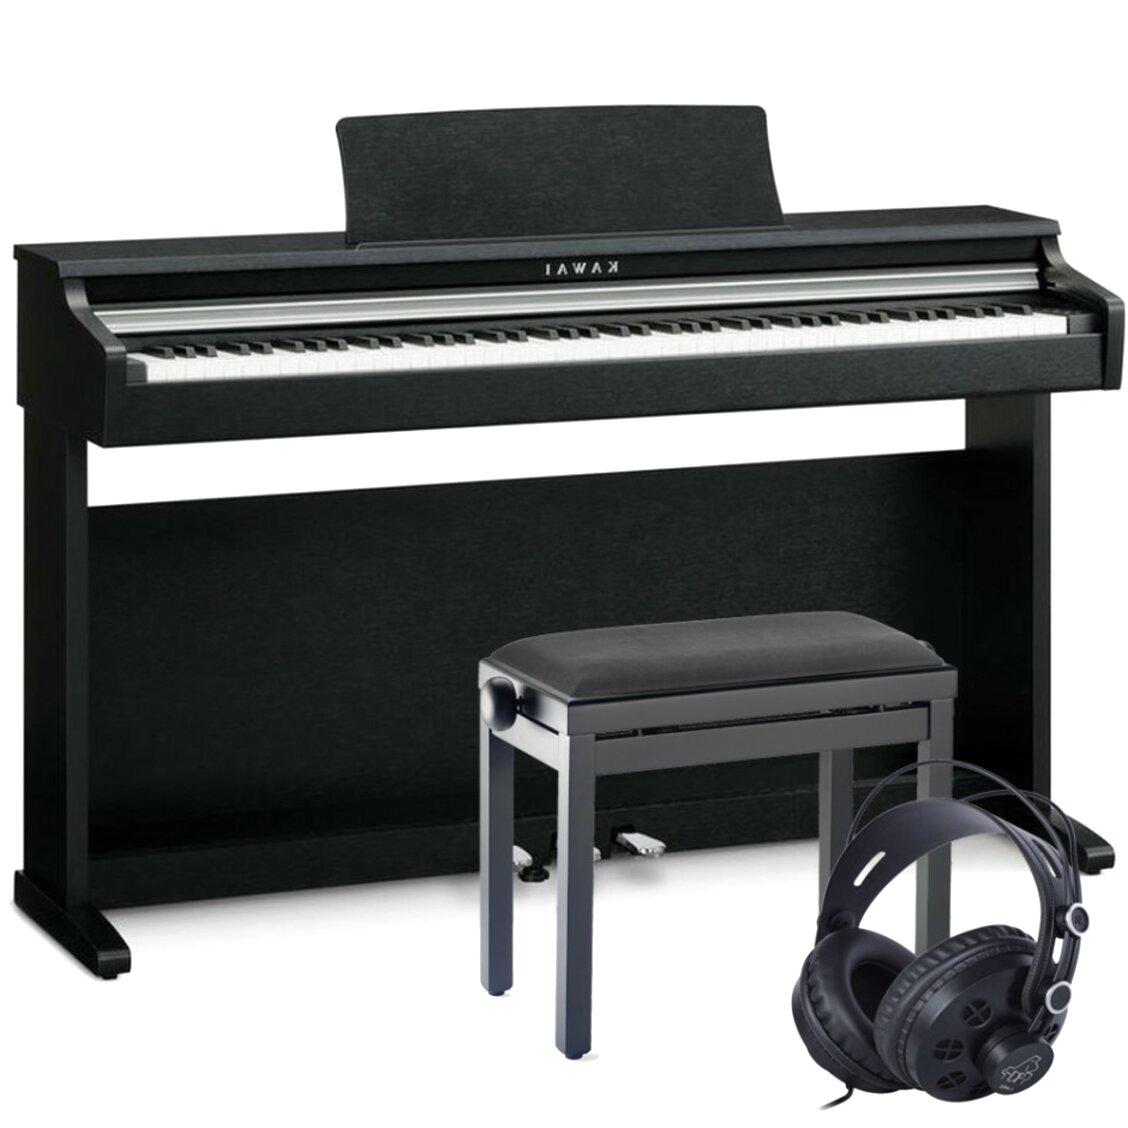 digital piano kawai for sale